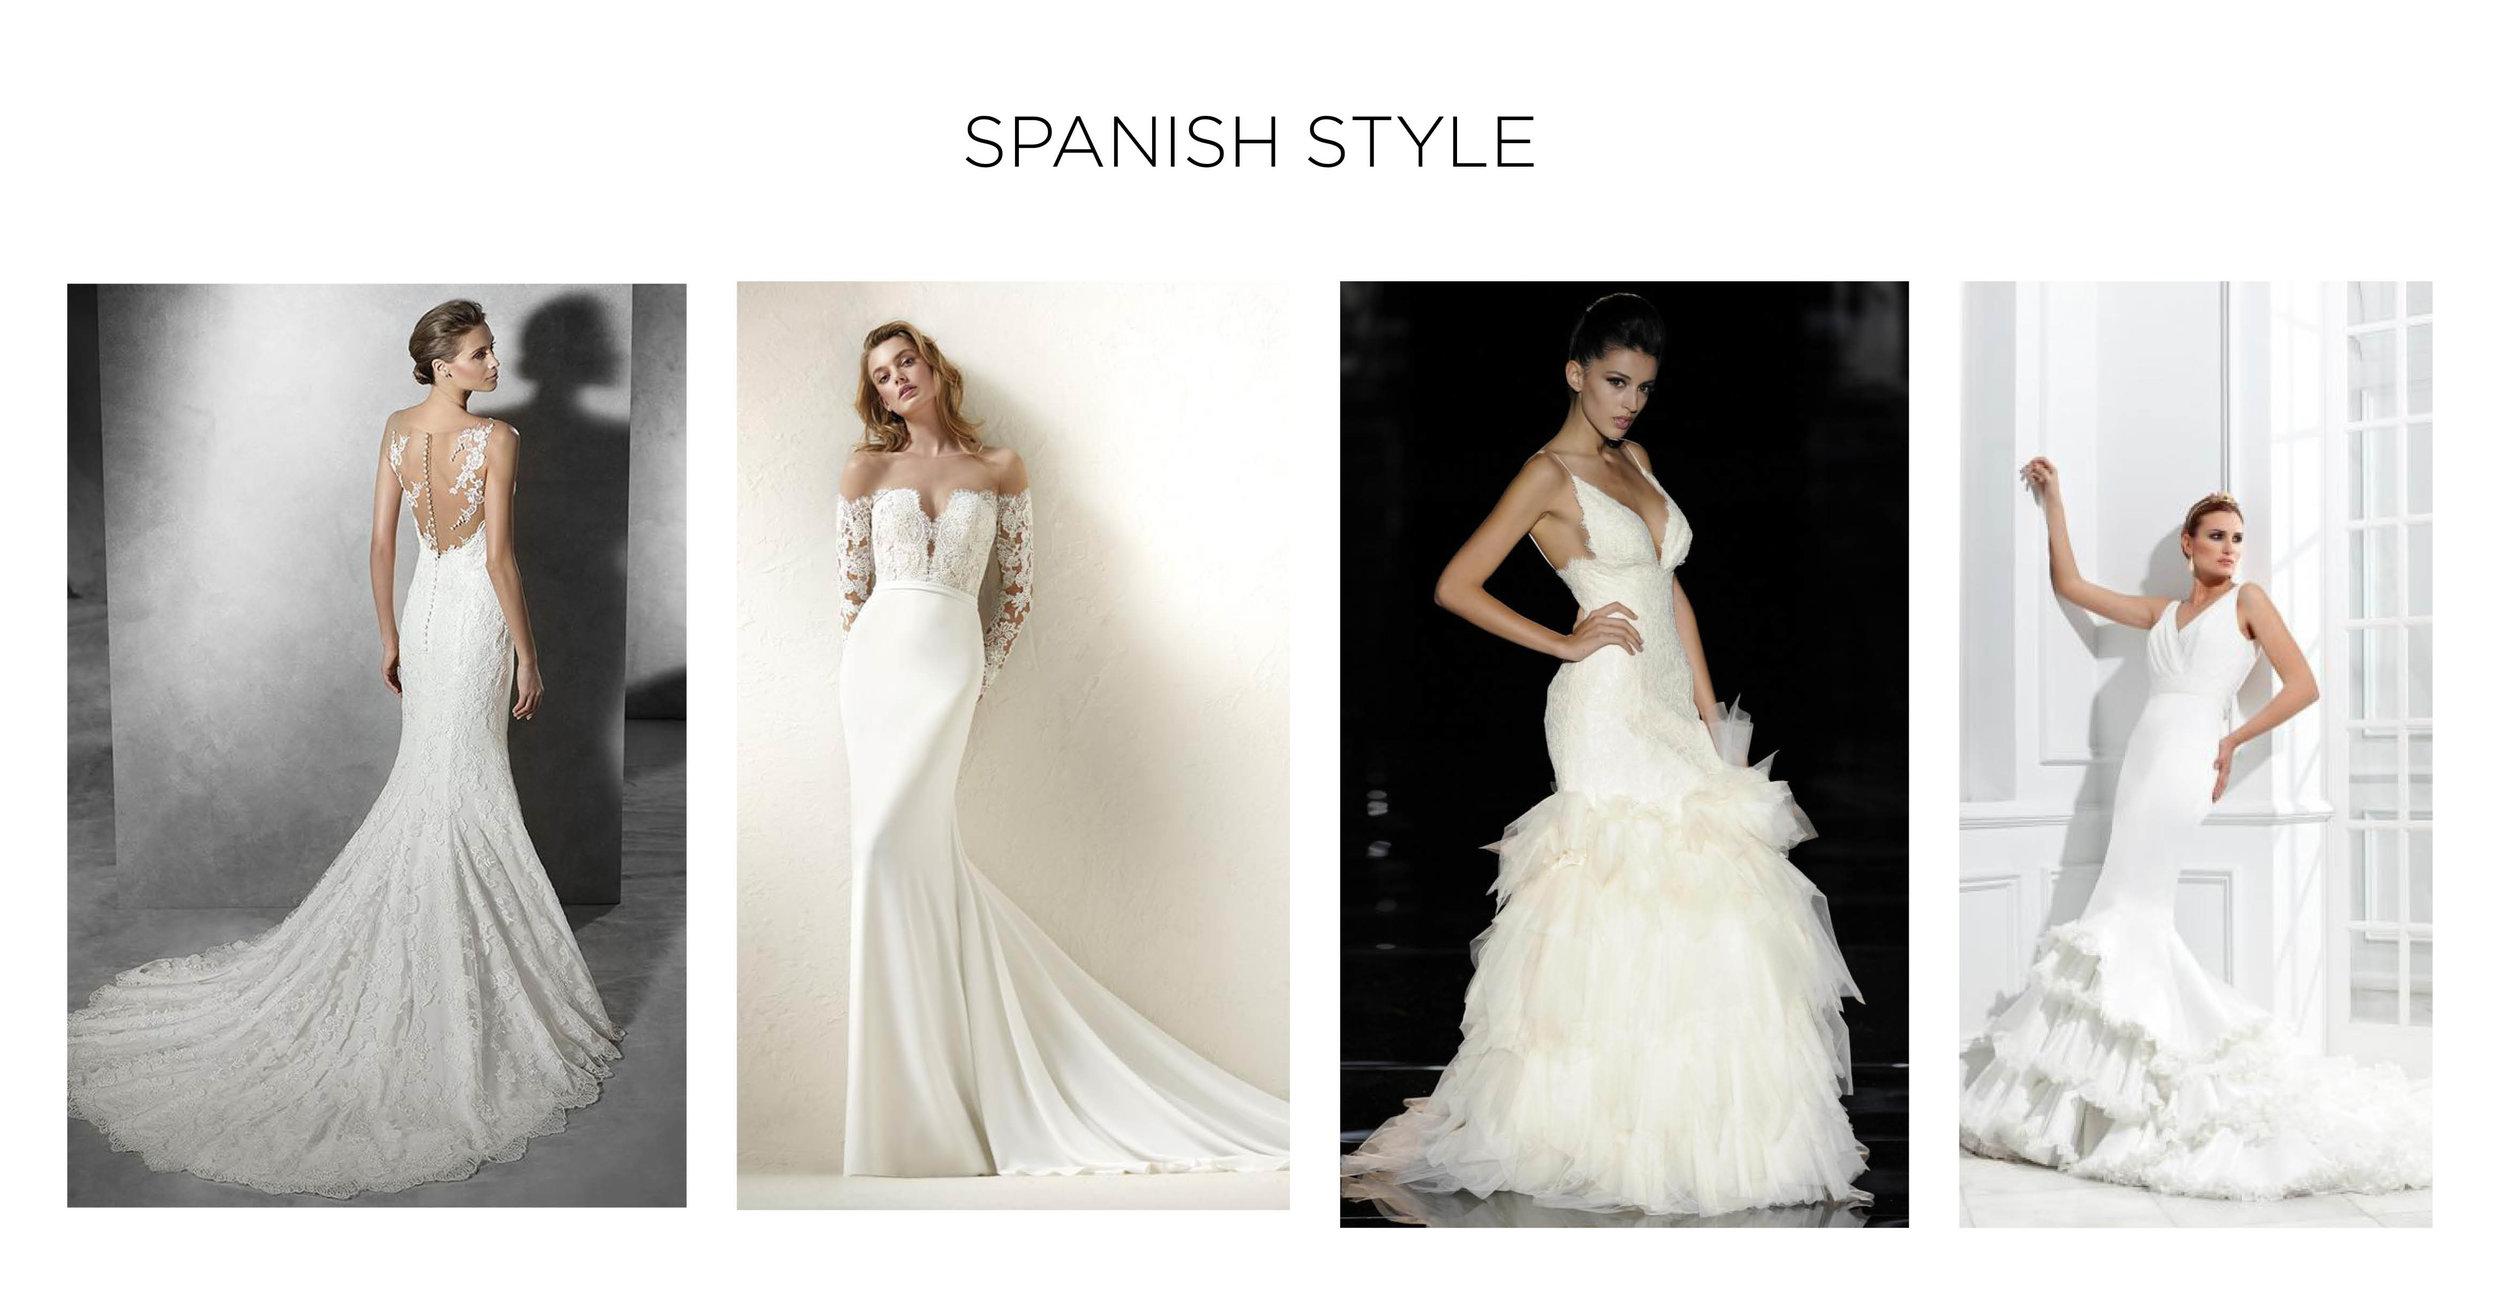 spanish flamenco wedding dress wedding majorca wedding planner wedding dress mallorca wedding dresses .jpg